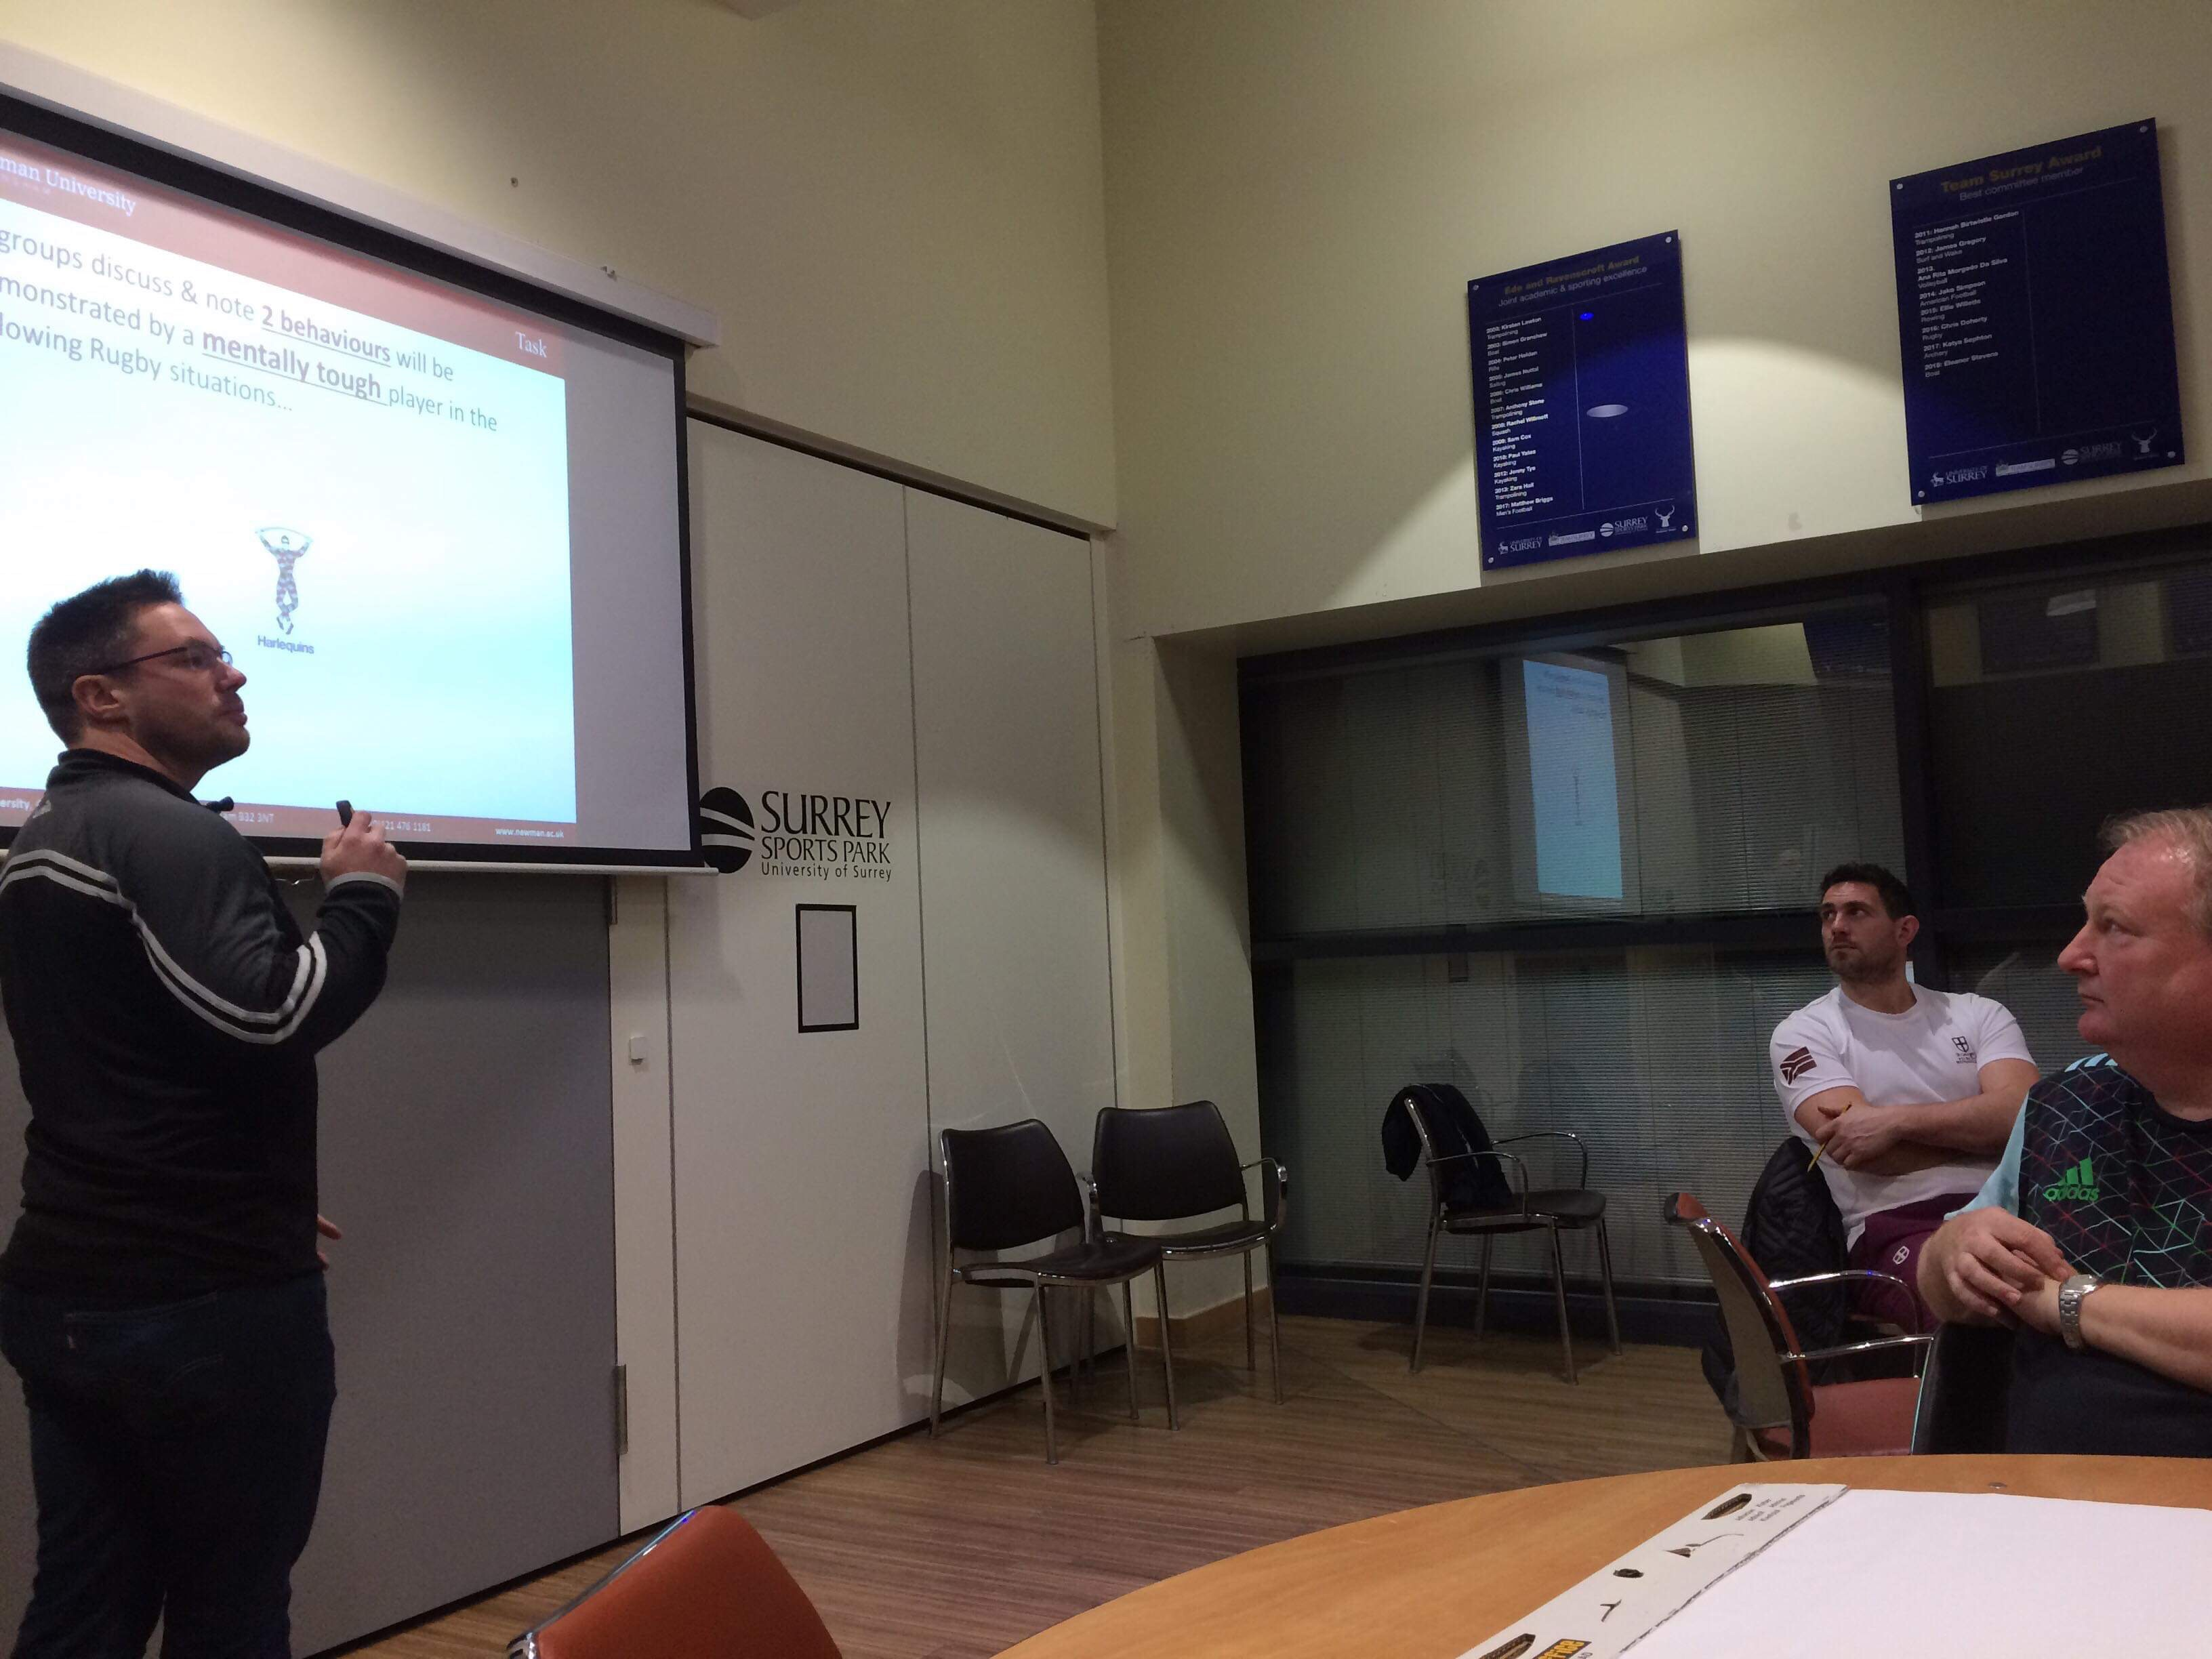 Alex Powell presenting